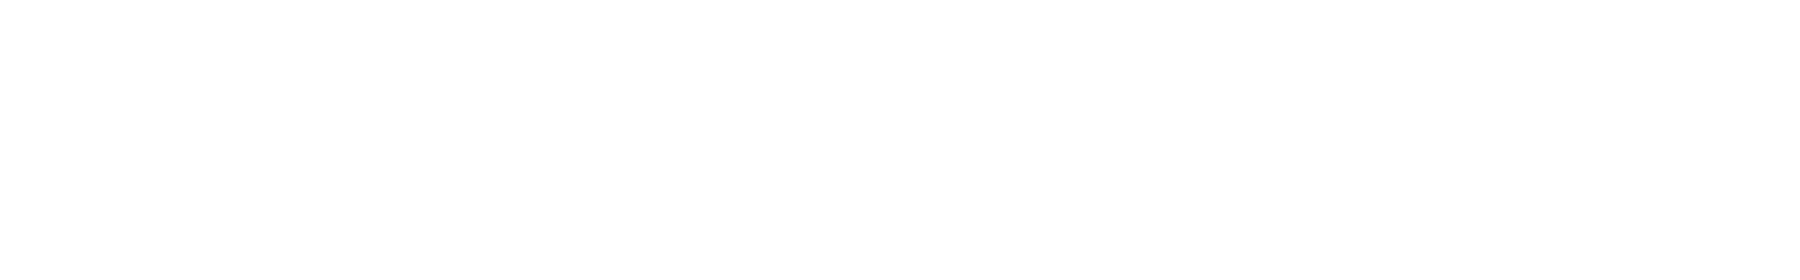 vedh sax lick 03 cm 124bpm